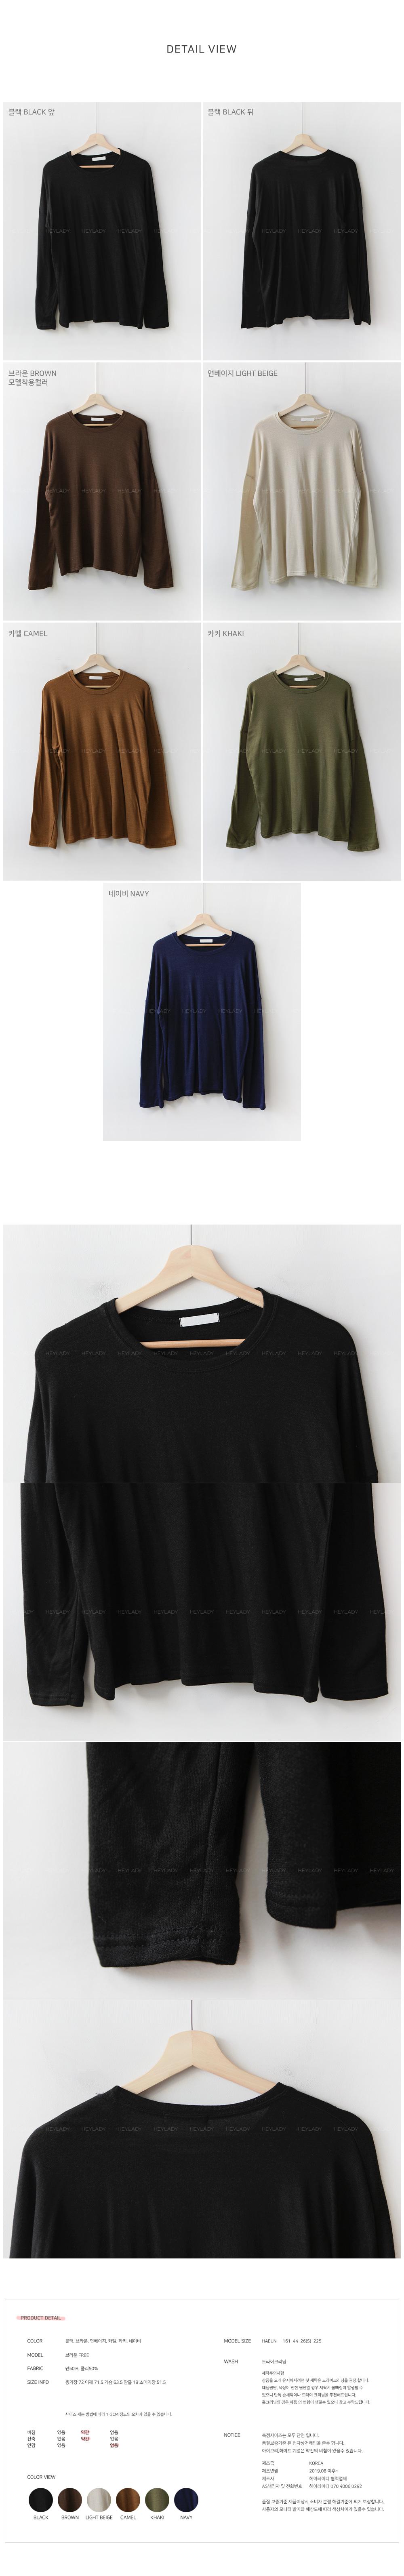 1 + 1 plan product! Motif Long-sleeved tee